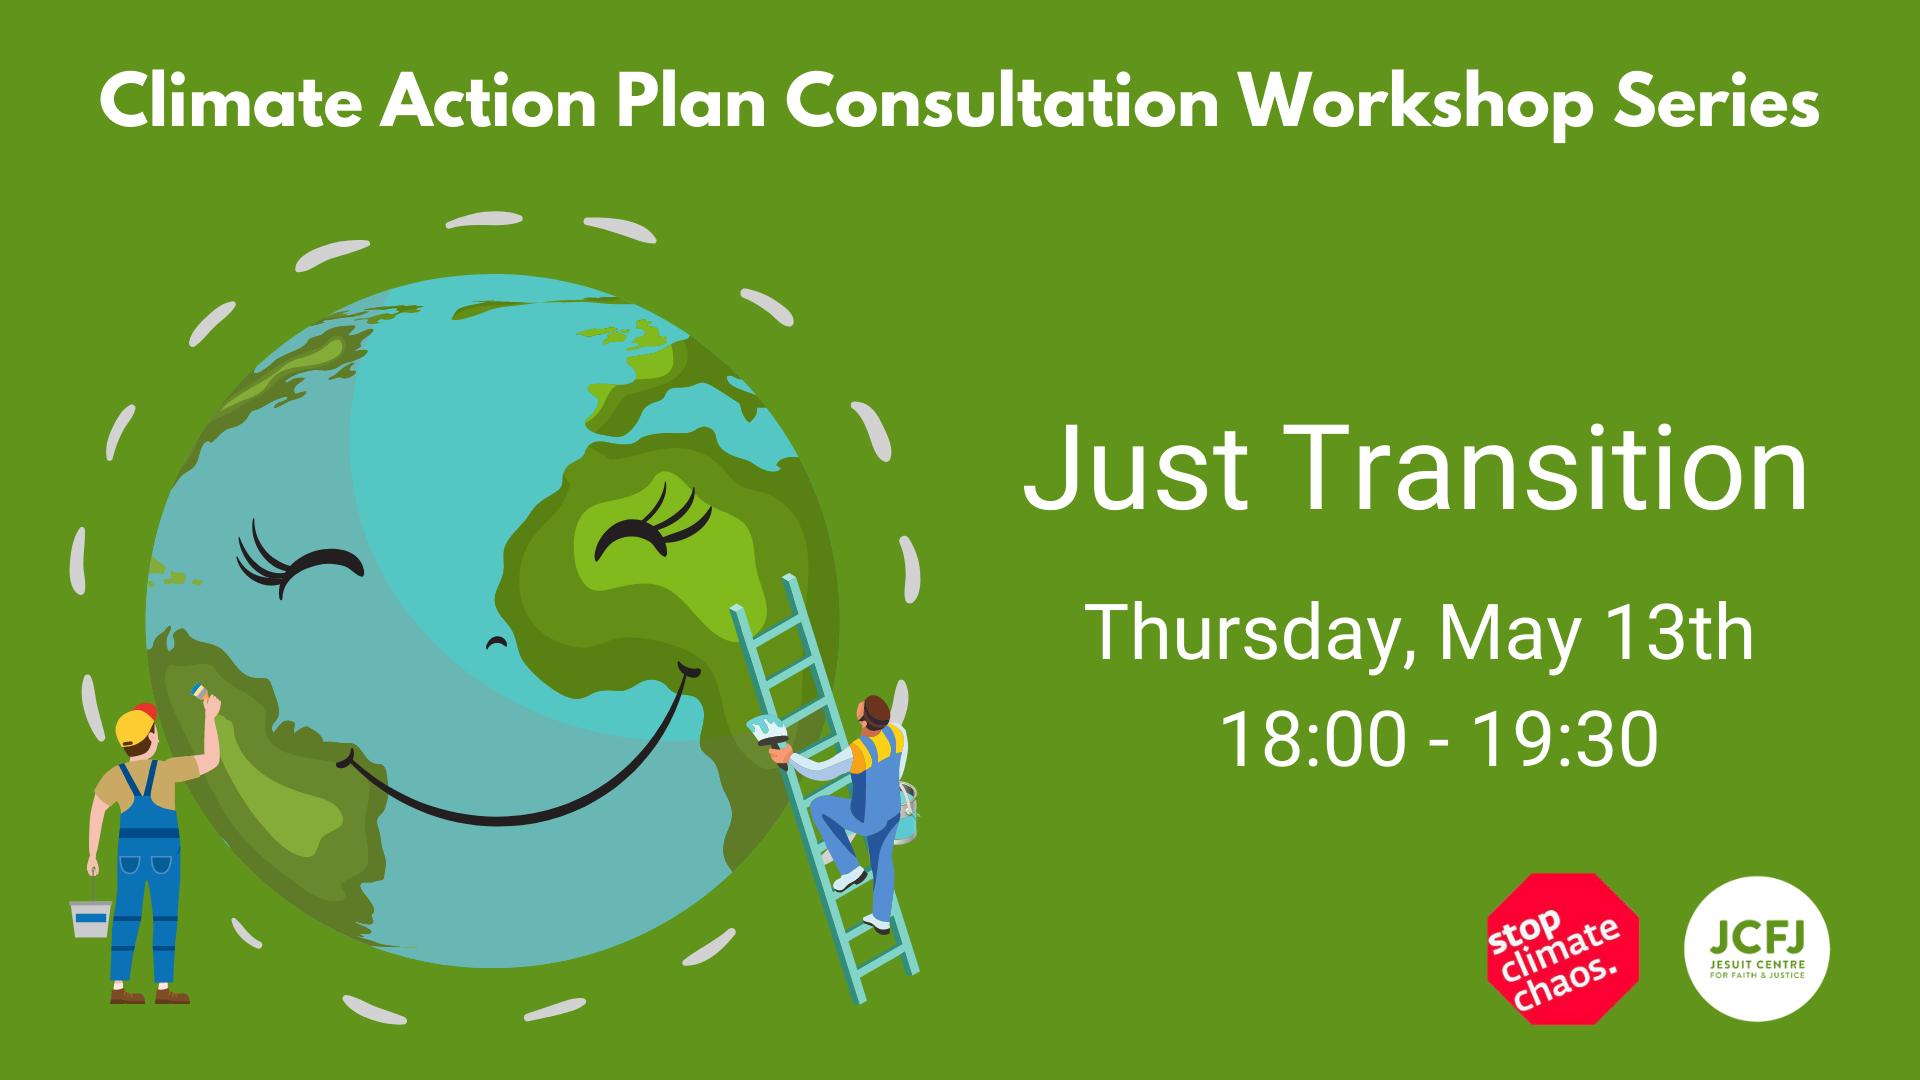 Just Transition Consultation Workshop